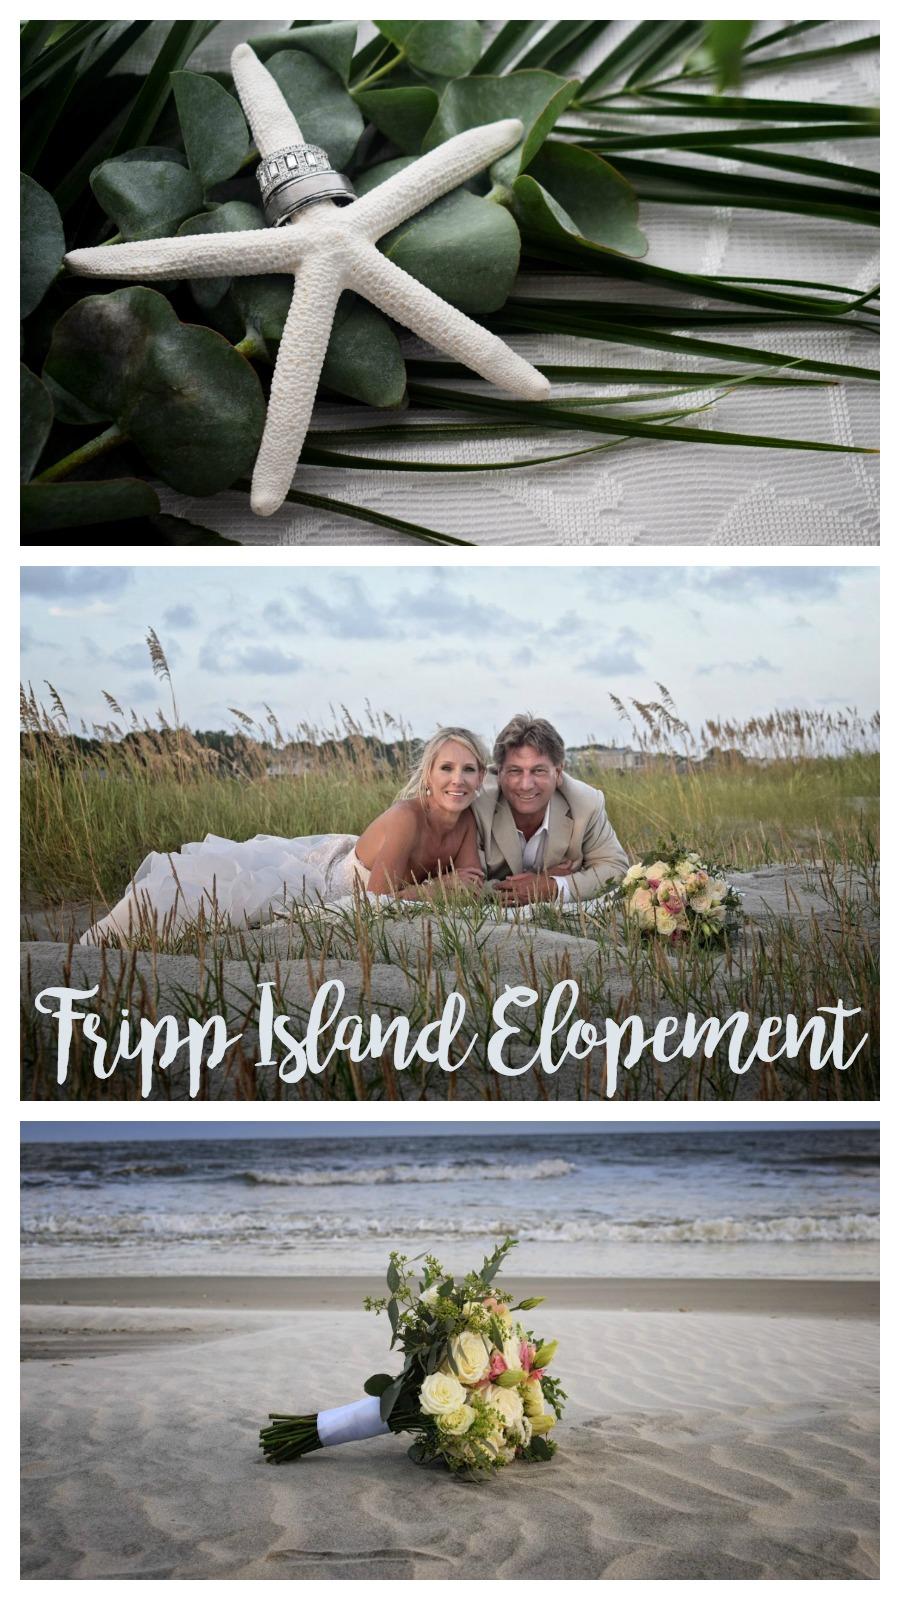 Marian and Jeff: Oceanfront Fripp Island Elopement | Palmetto State Weddings | Dandelion Weddings Photography | South Carolina beach wedding | casual beach wedding inspiration